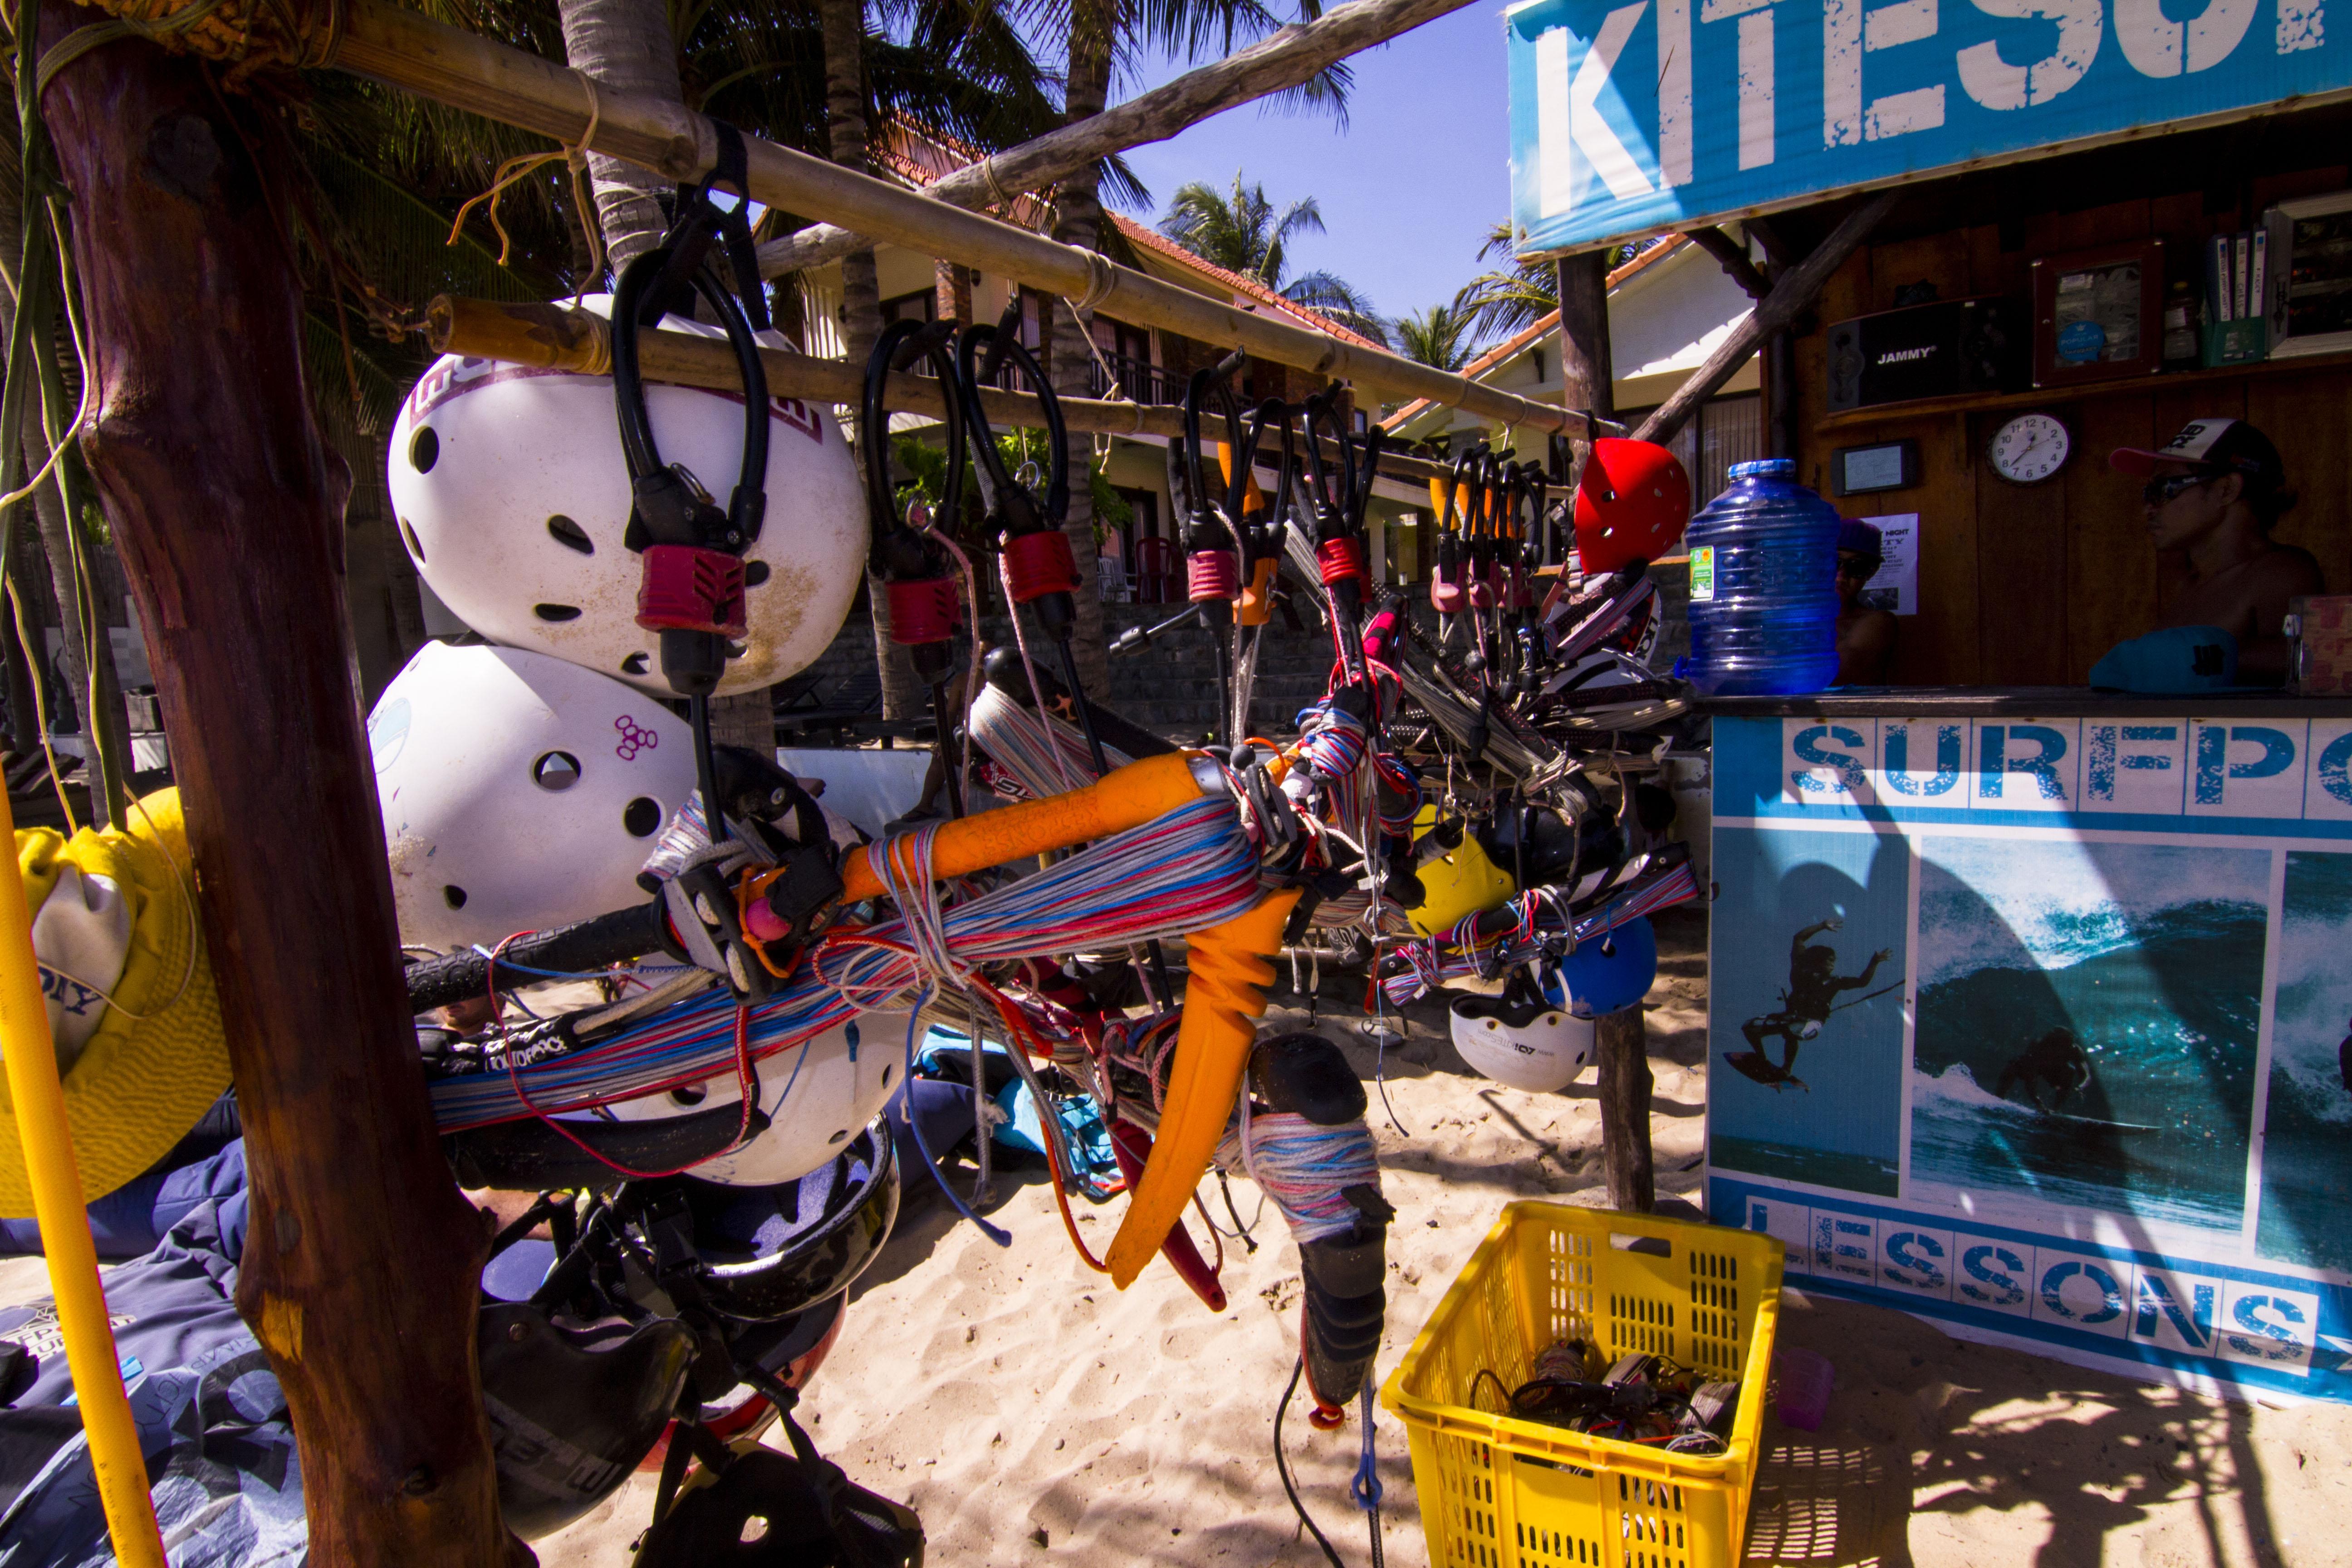 Kitesurfing Gear Rental